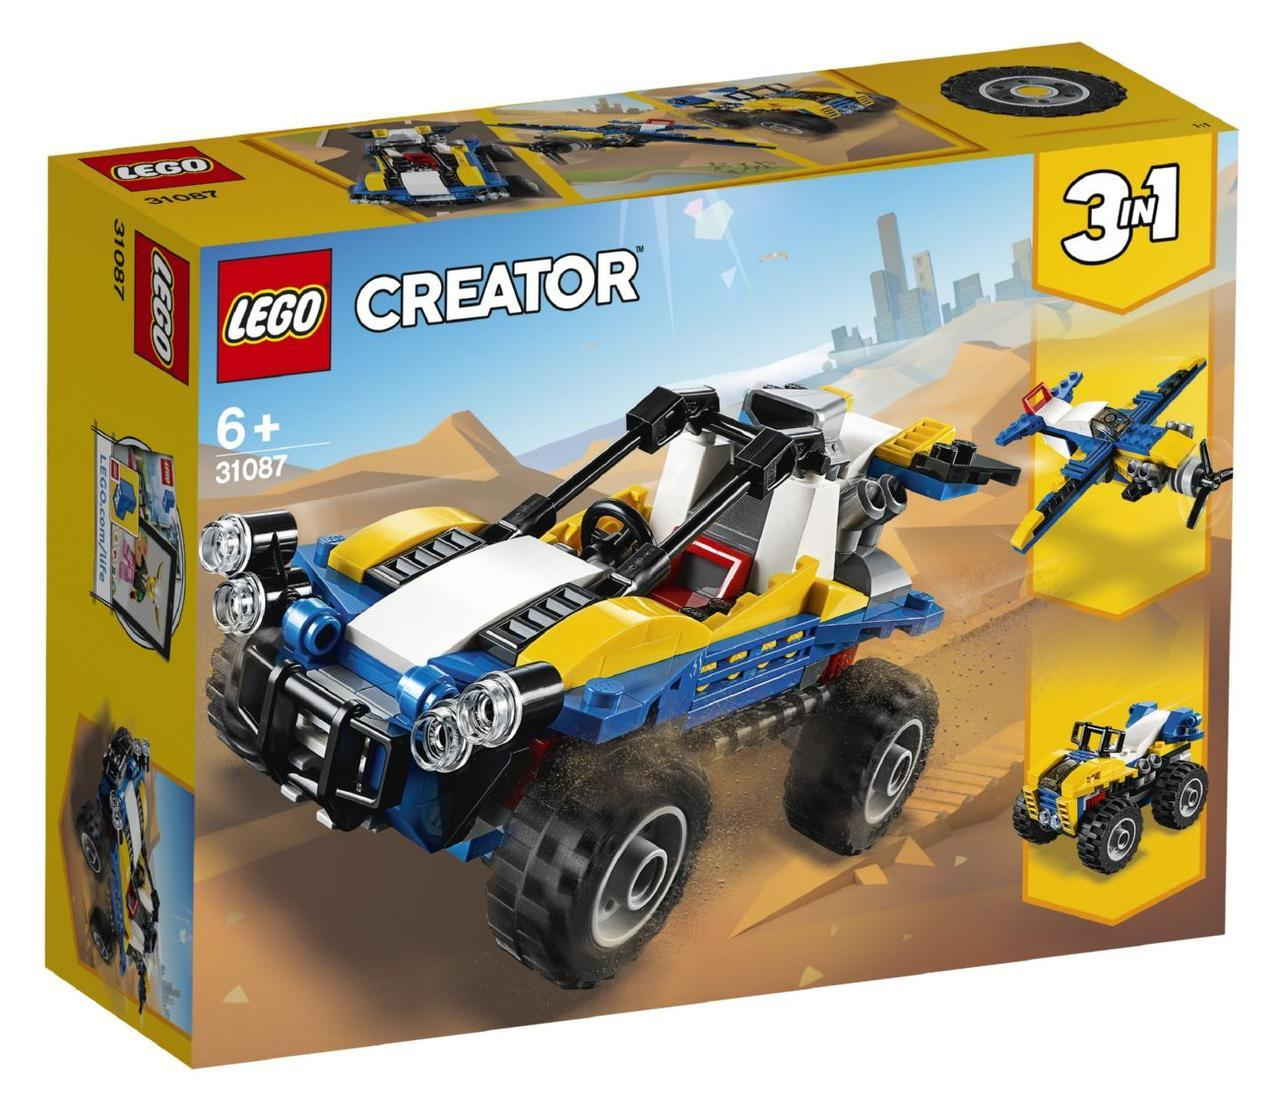 Lego Creator Пустельний баггі 31087